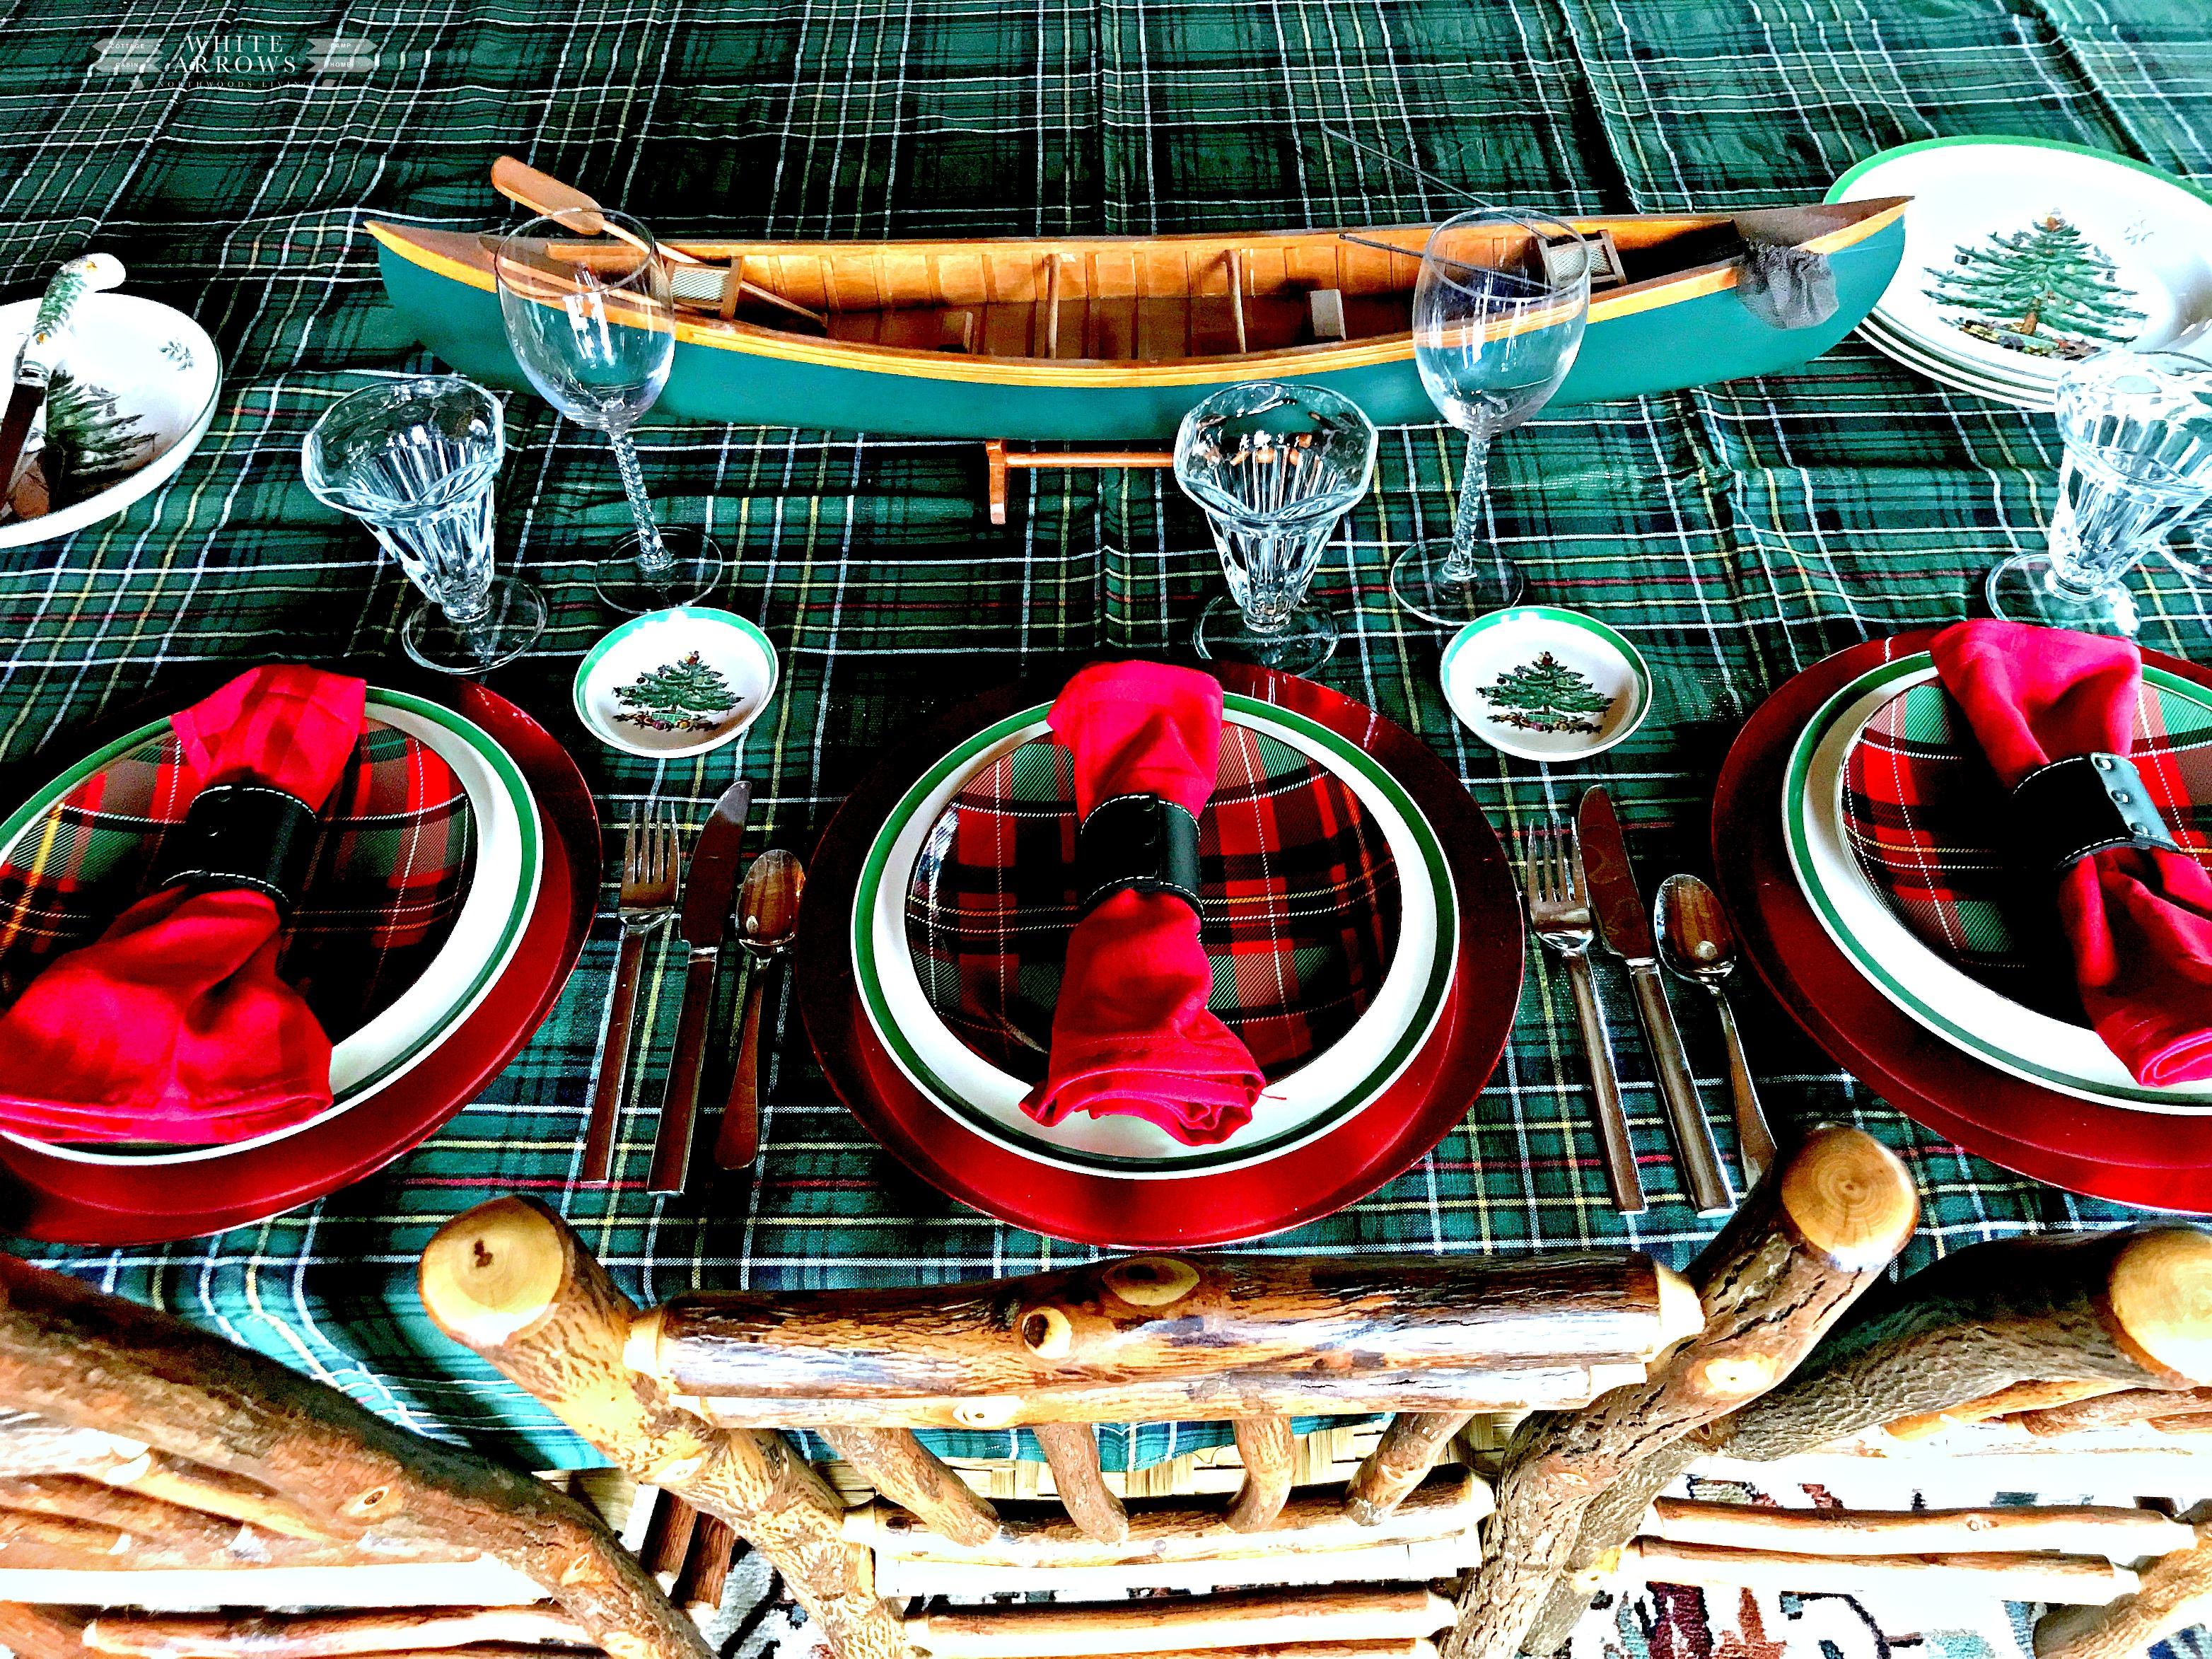 Christmas table, Lake House, Cabin Dining Room, Christmas Tablescape, Lake House, Holiday Decor, Christmas Decor, Tartan, Plaid, Spode,